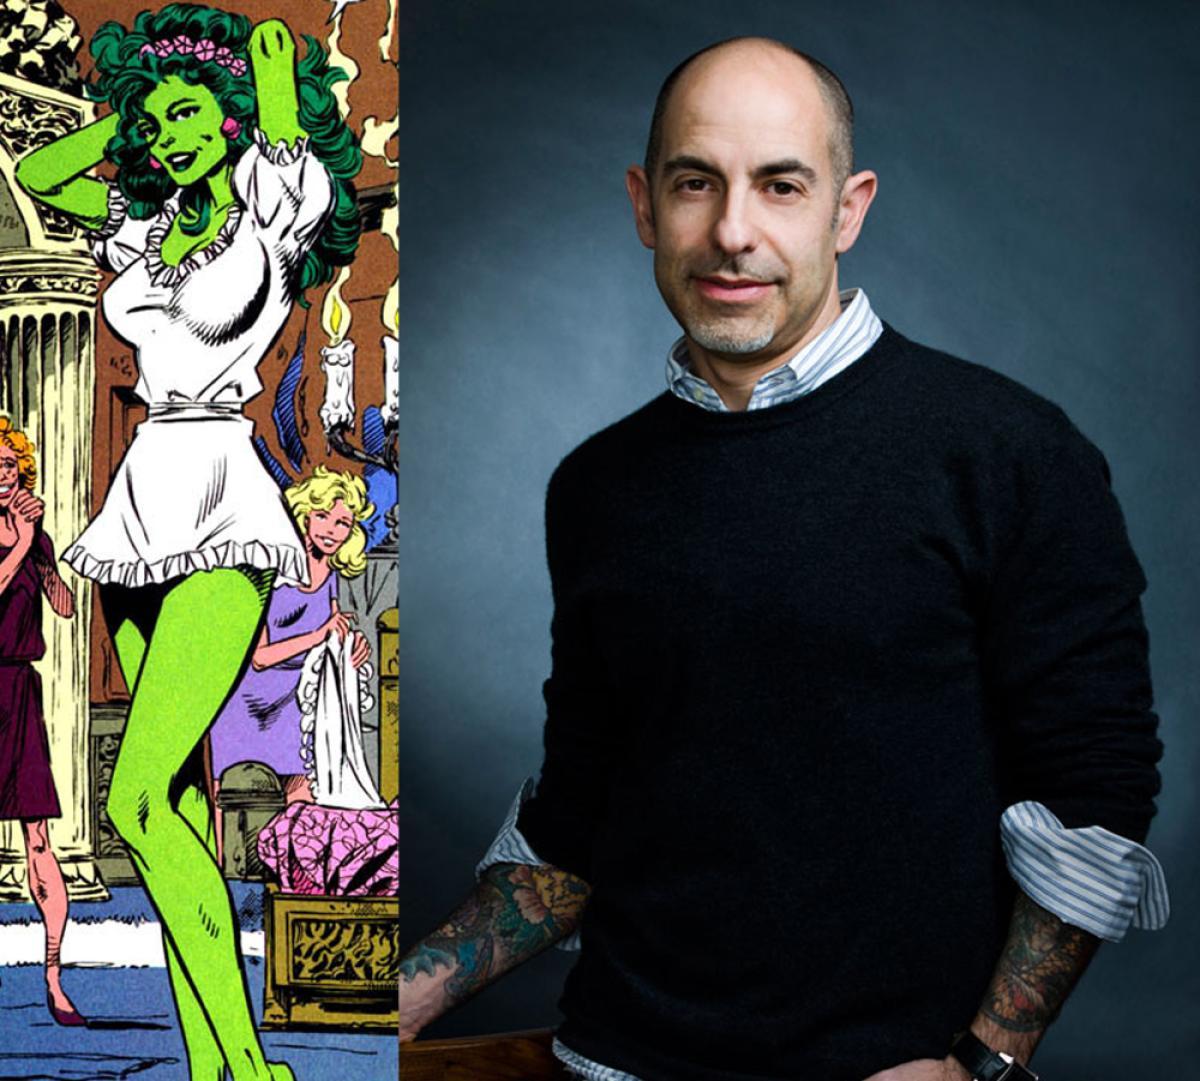 Cabreada Porn david goyer, guionista de batman v superman, compara a hulka